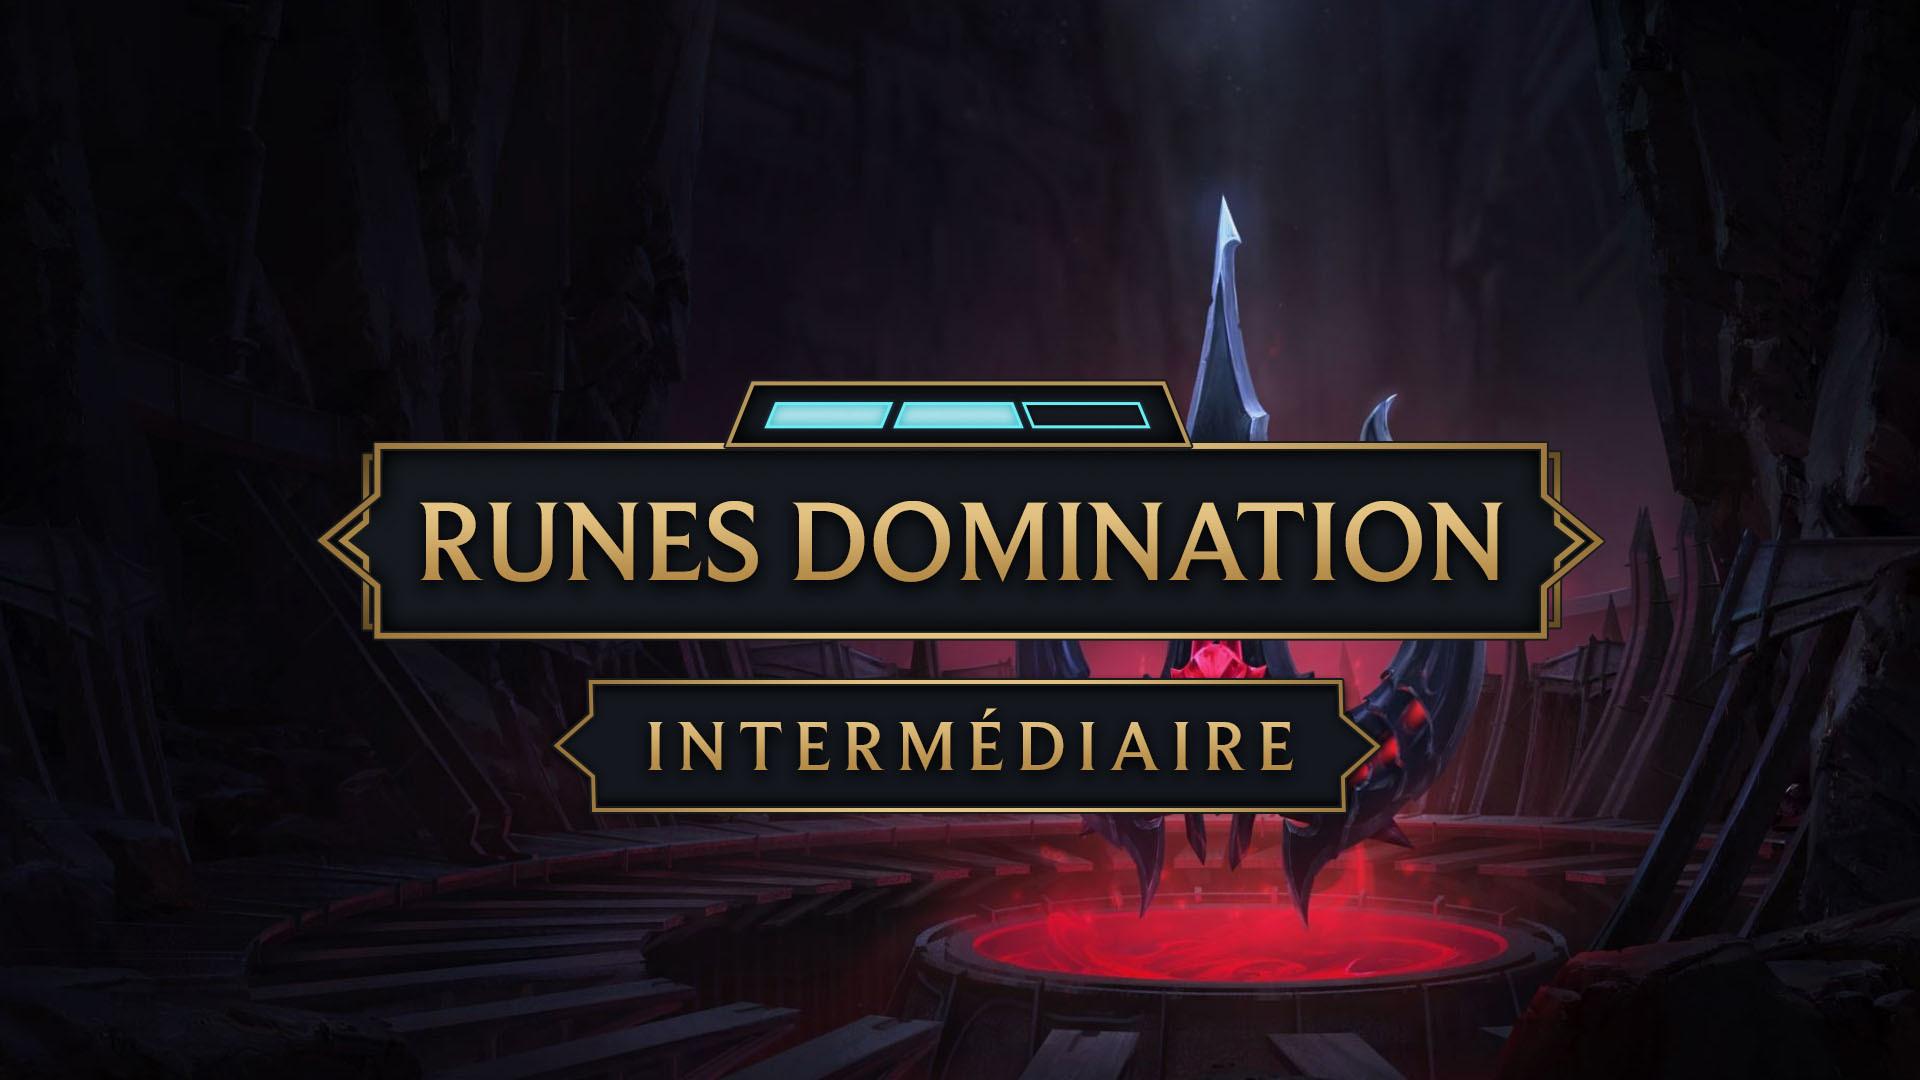 Runes domination 1